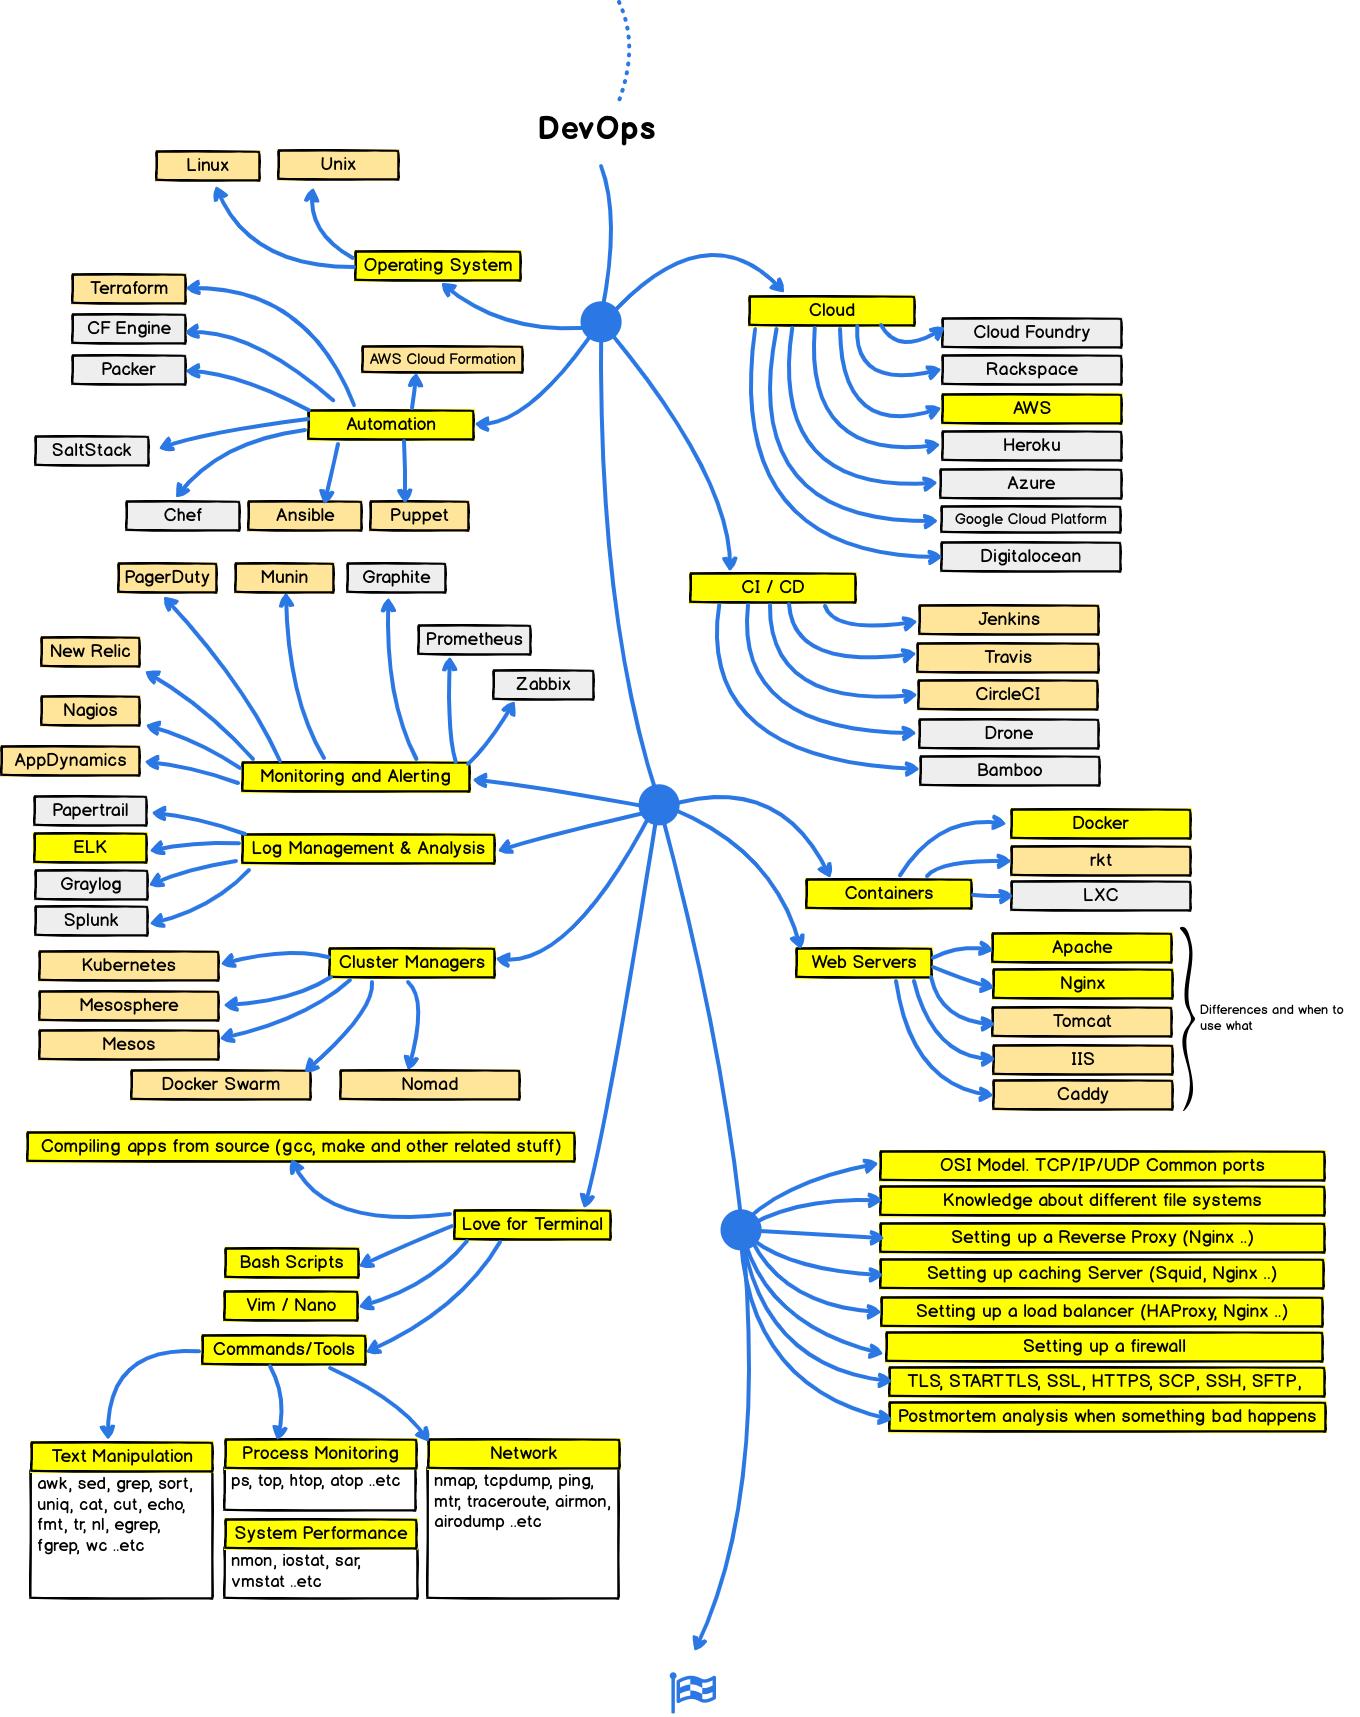 web developer roadmap 2018が出たので2017年版と比較してみる qiita